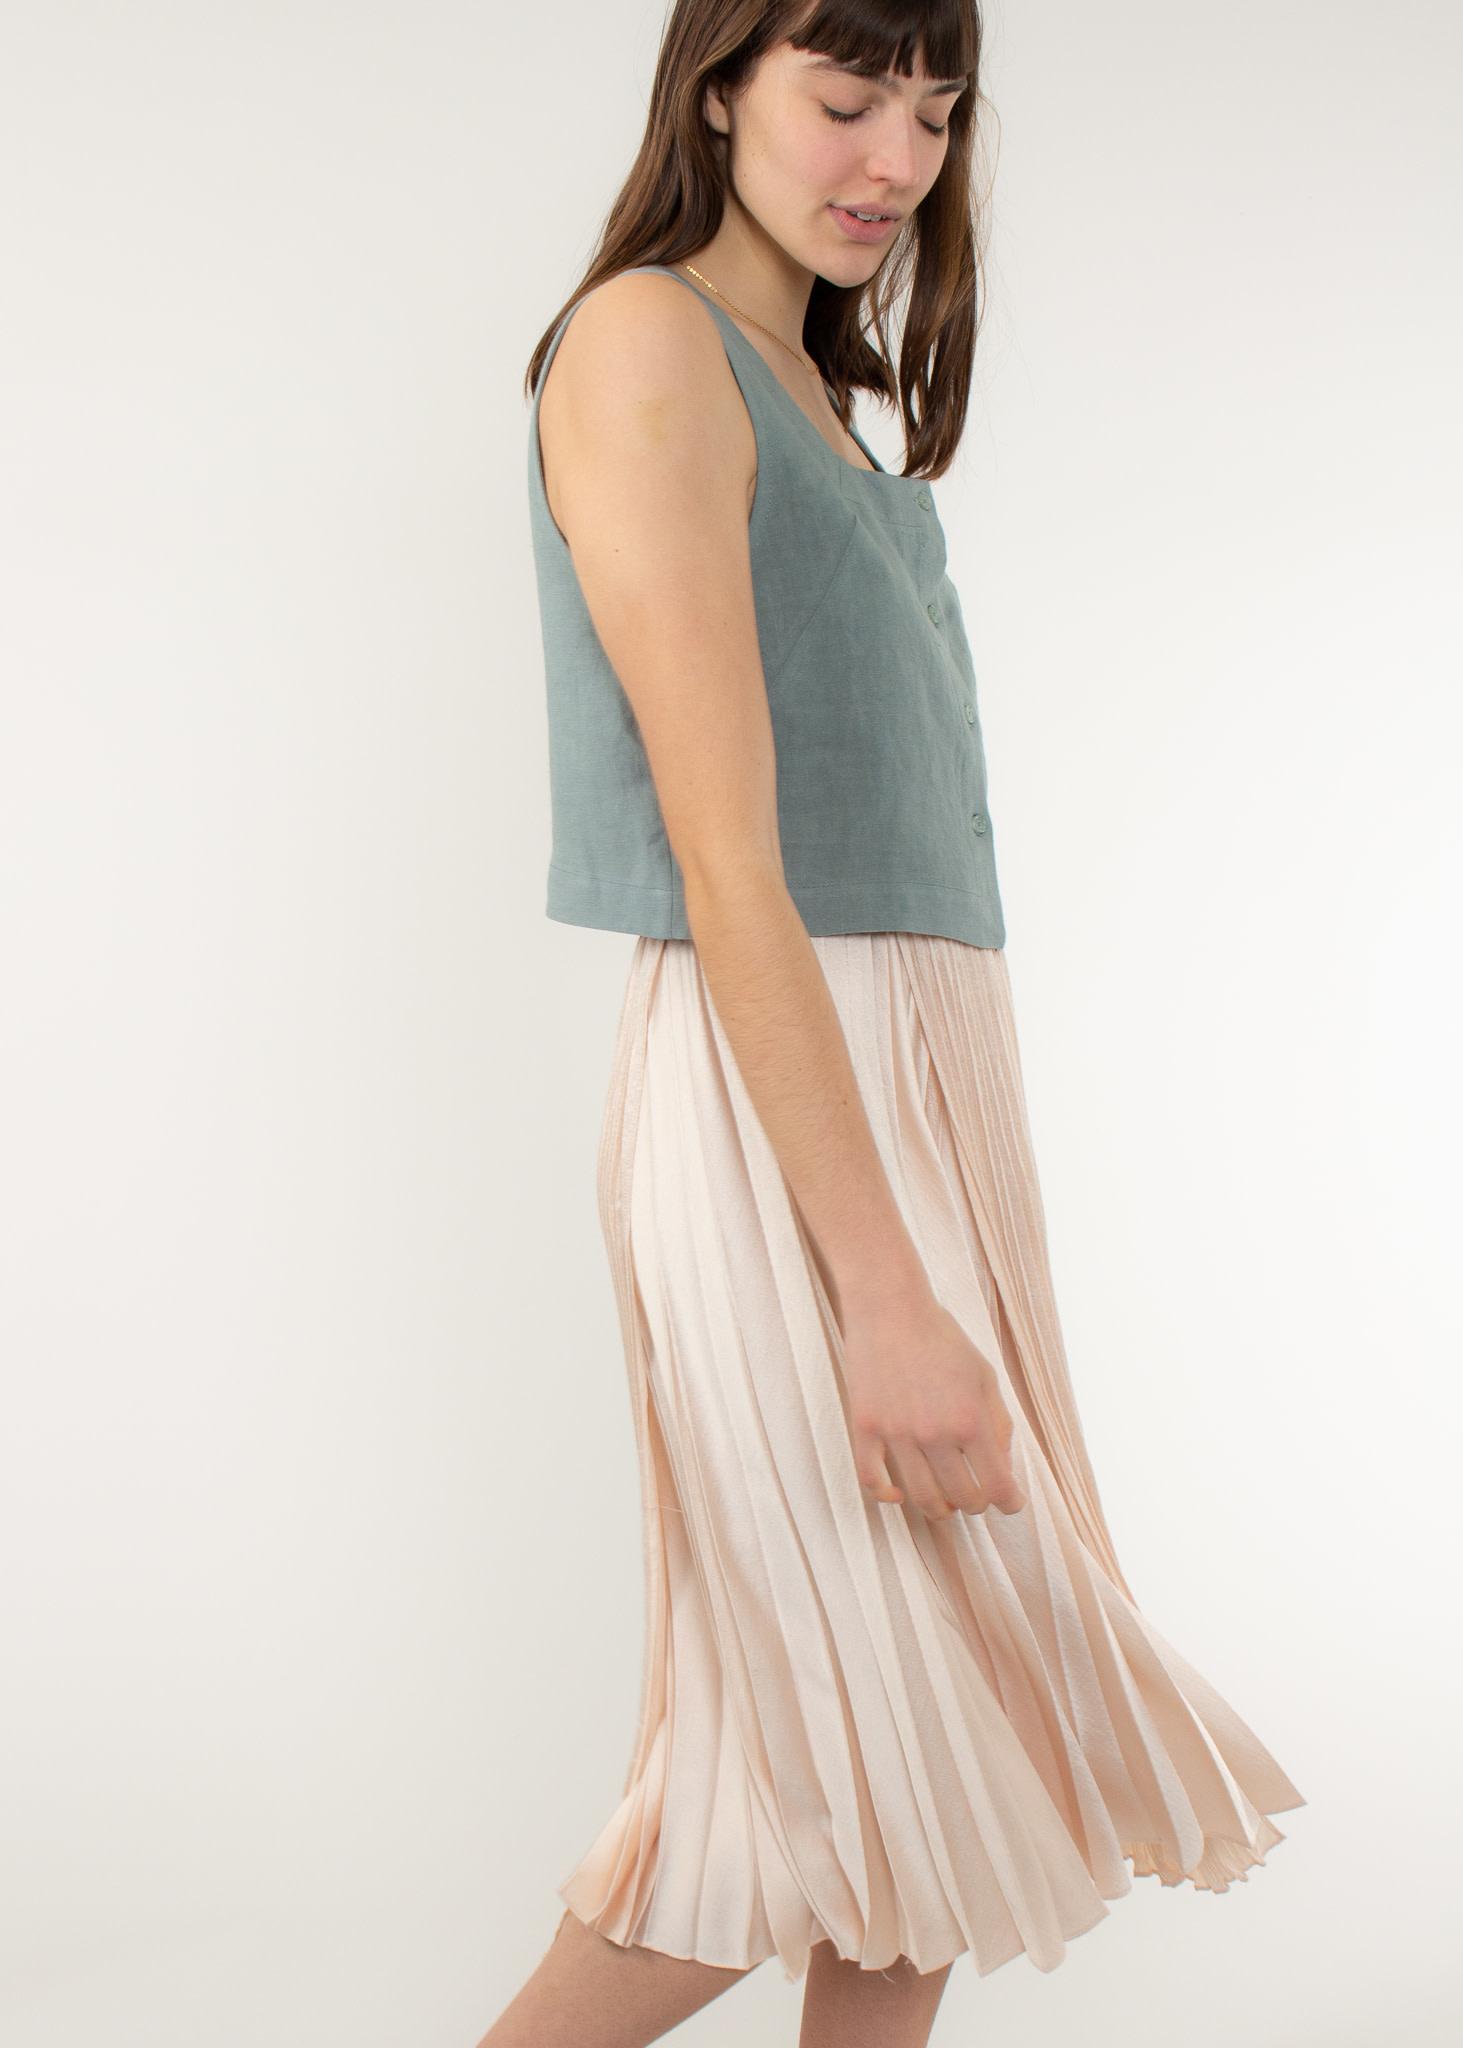 EVE GRAVEL Alice camisole